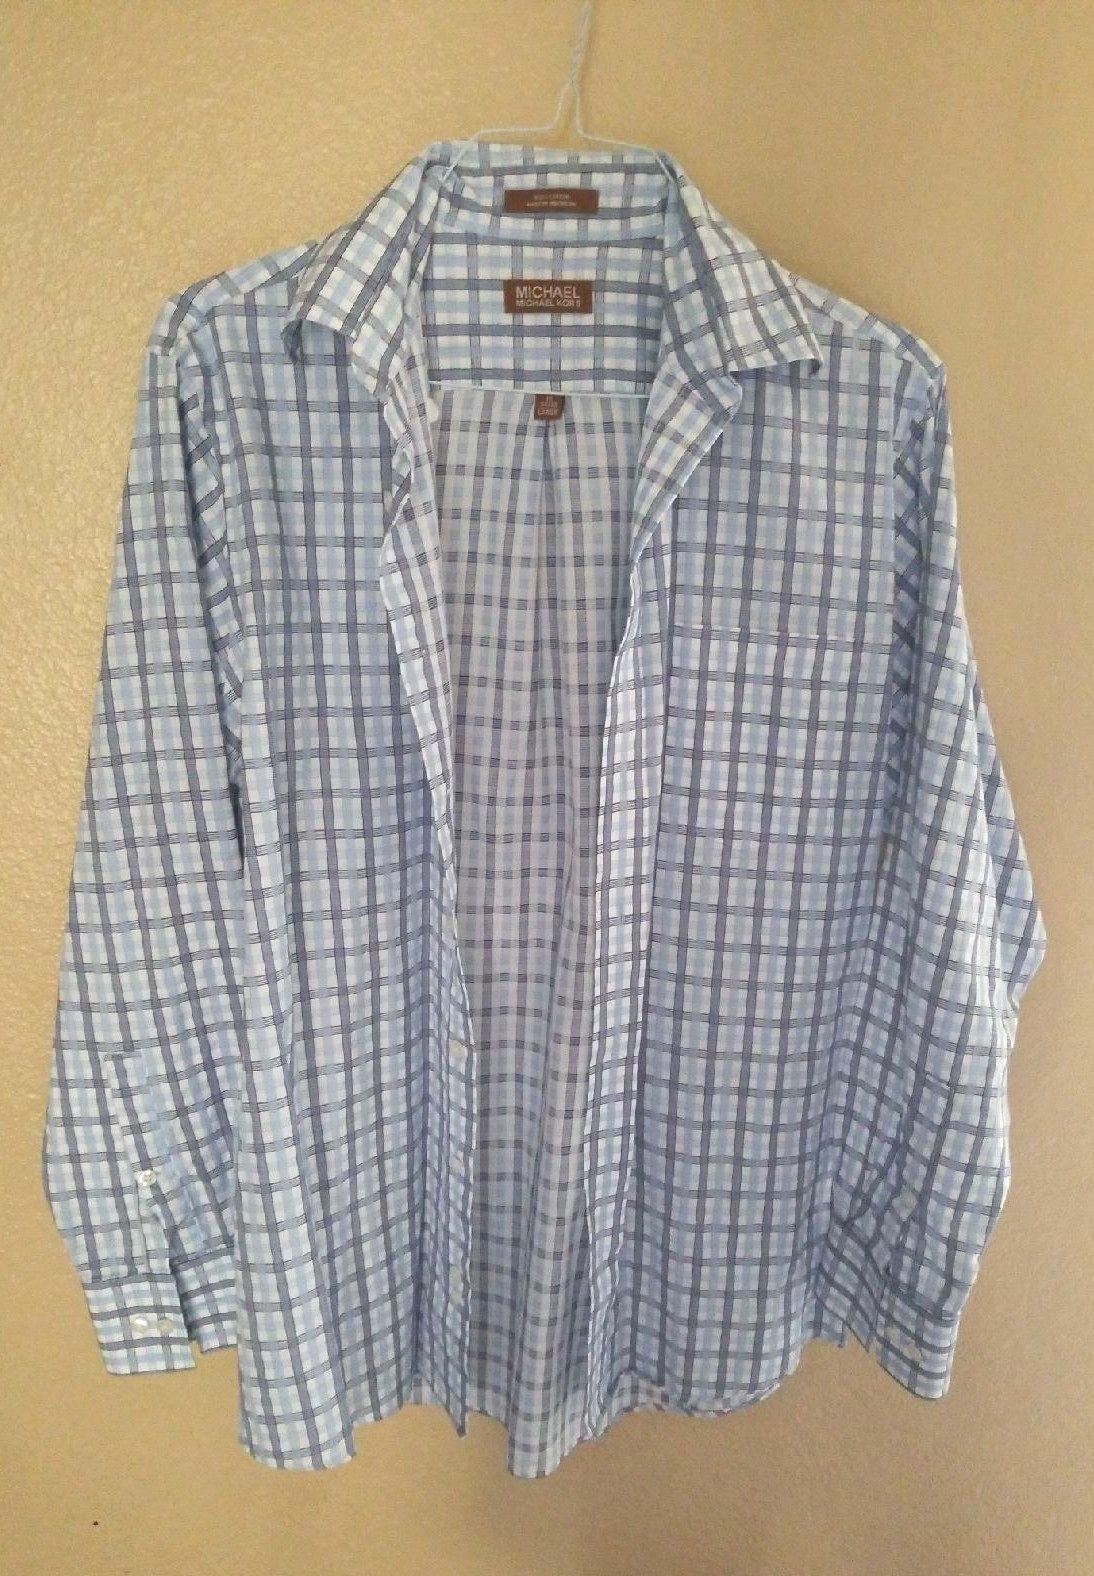 Michael Kors, IZOD dress shirt